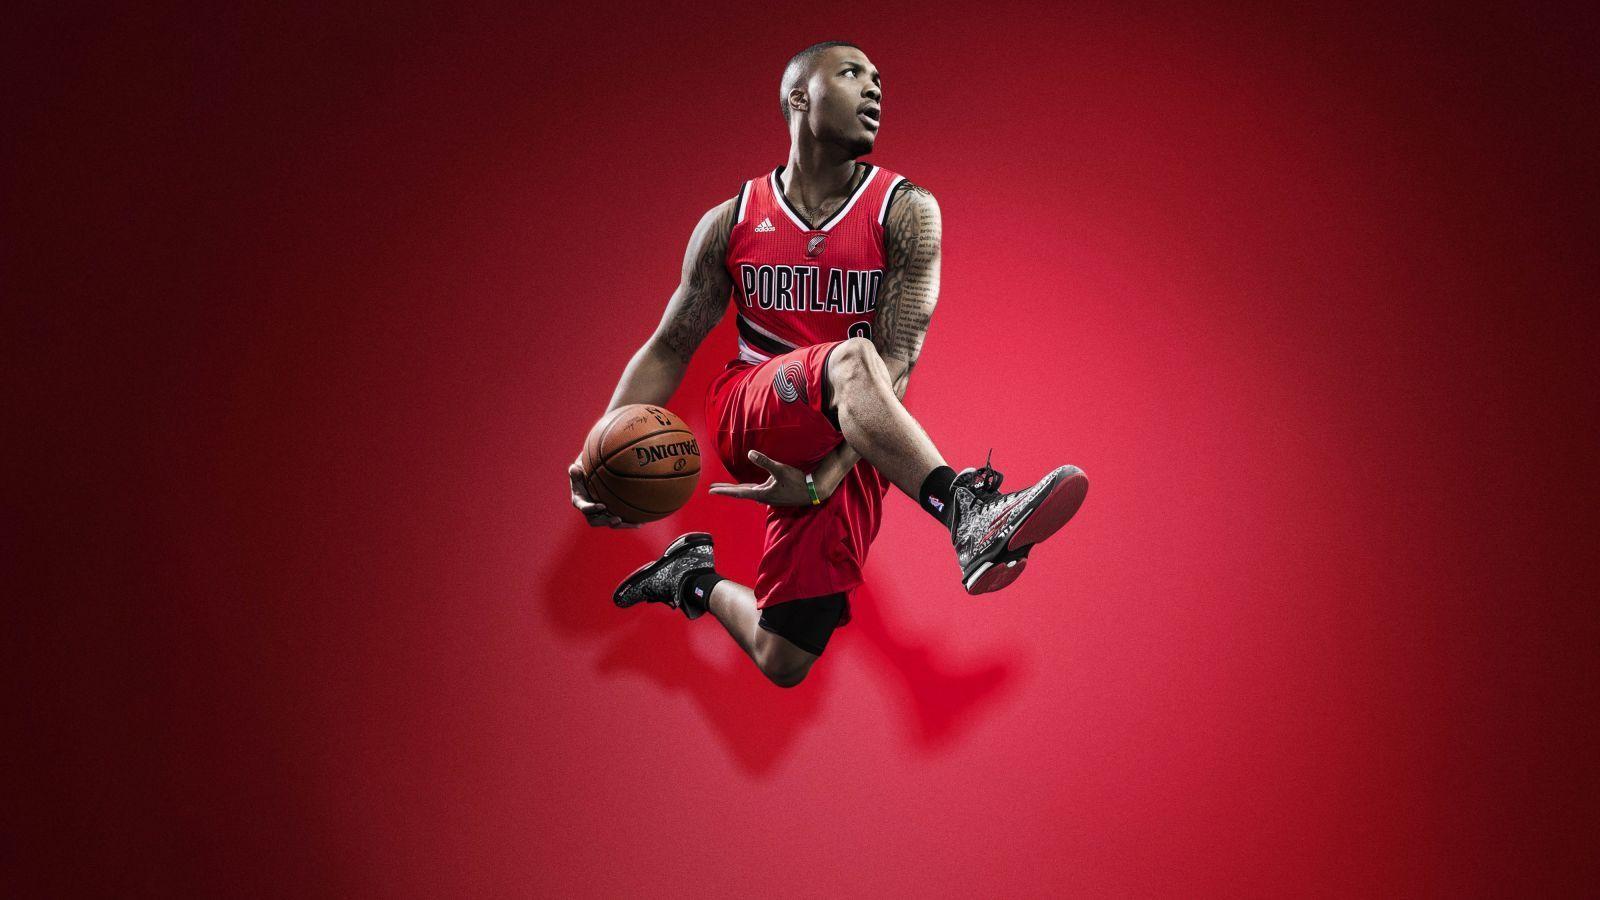 Adidas Basketball Wallpaper 2014